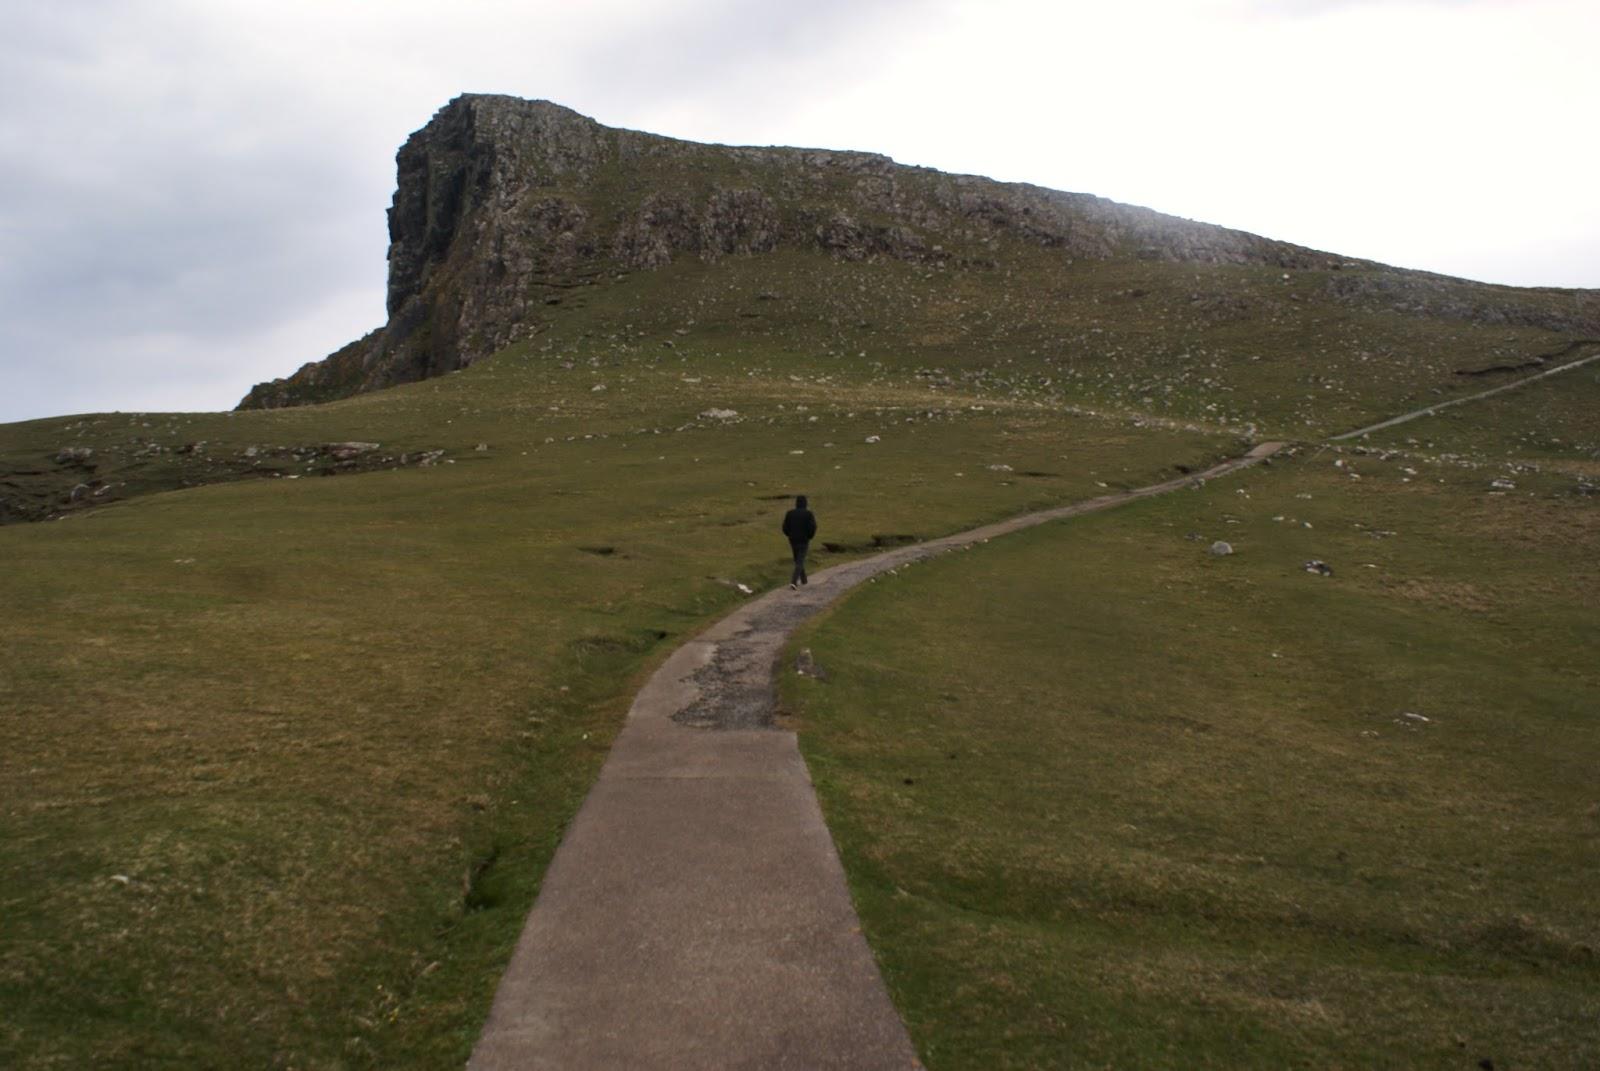 neist point skye scotland alba uk united kingdom